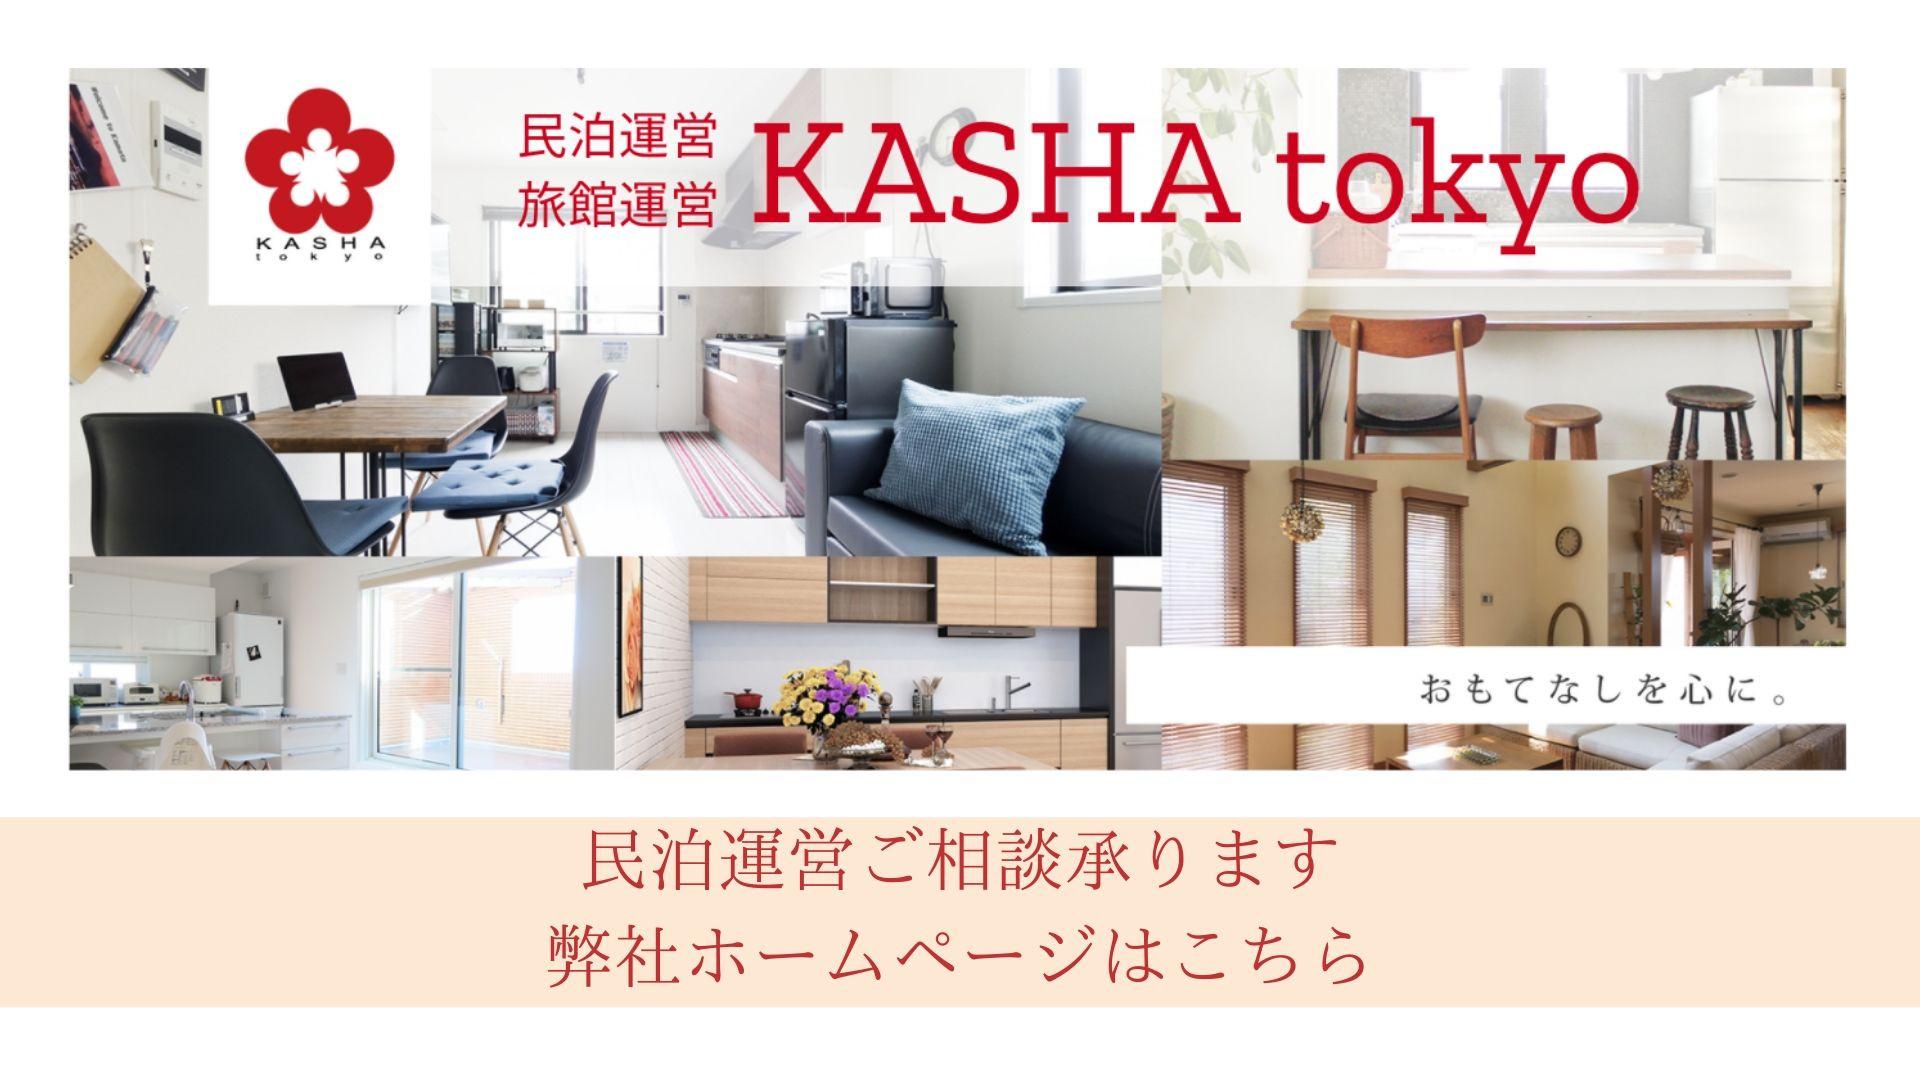 https://kashatokyo.co.jp/